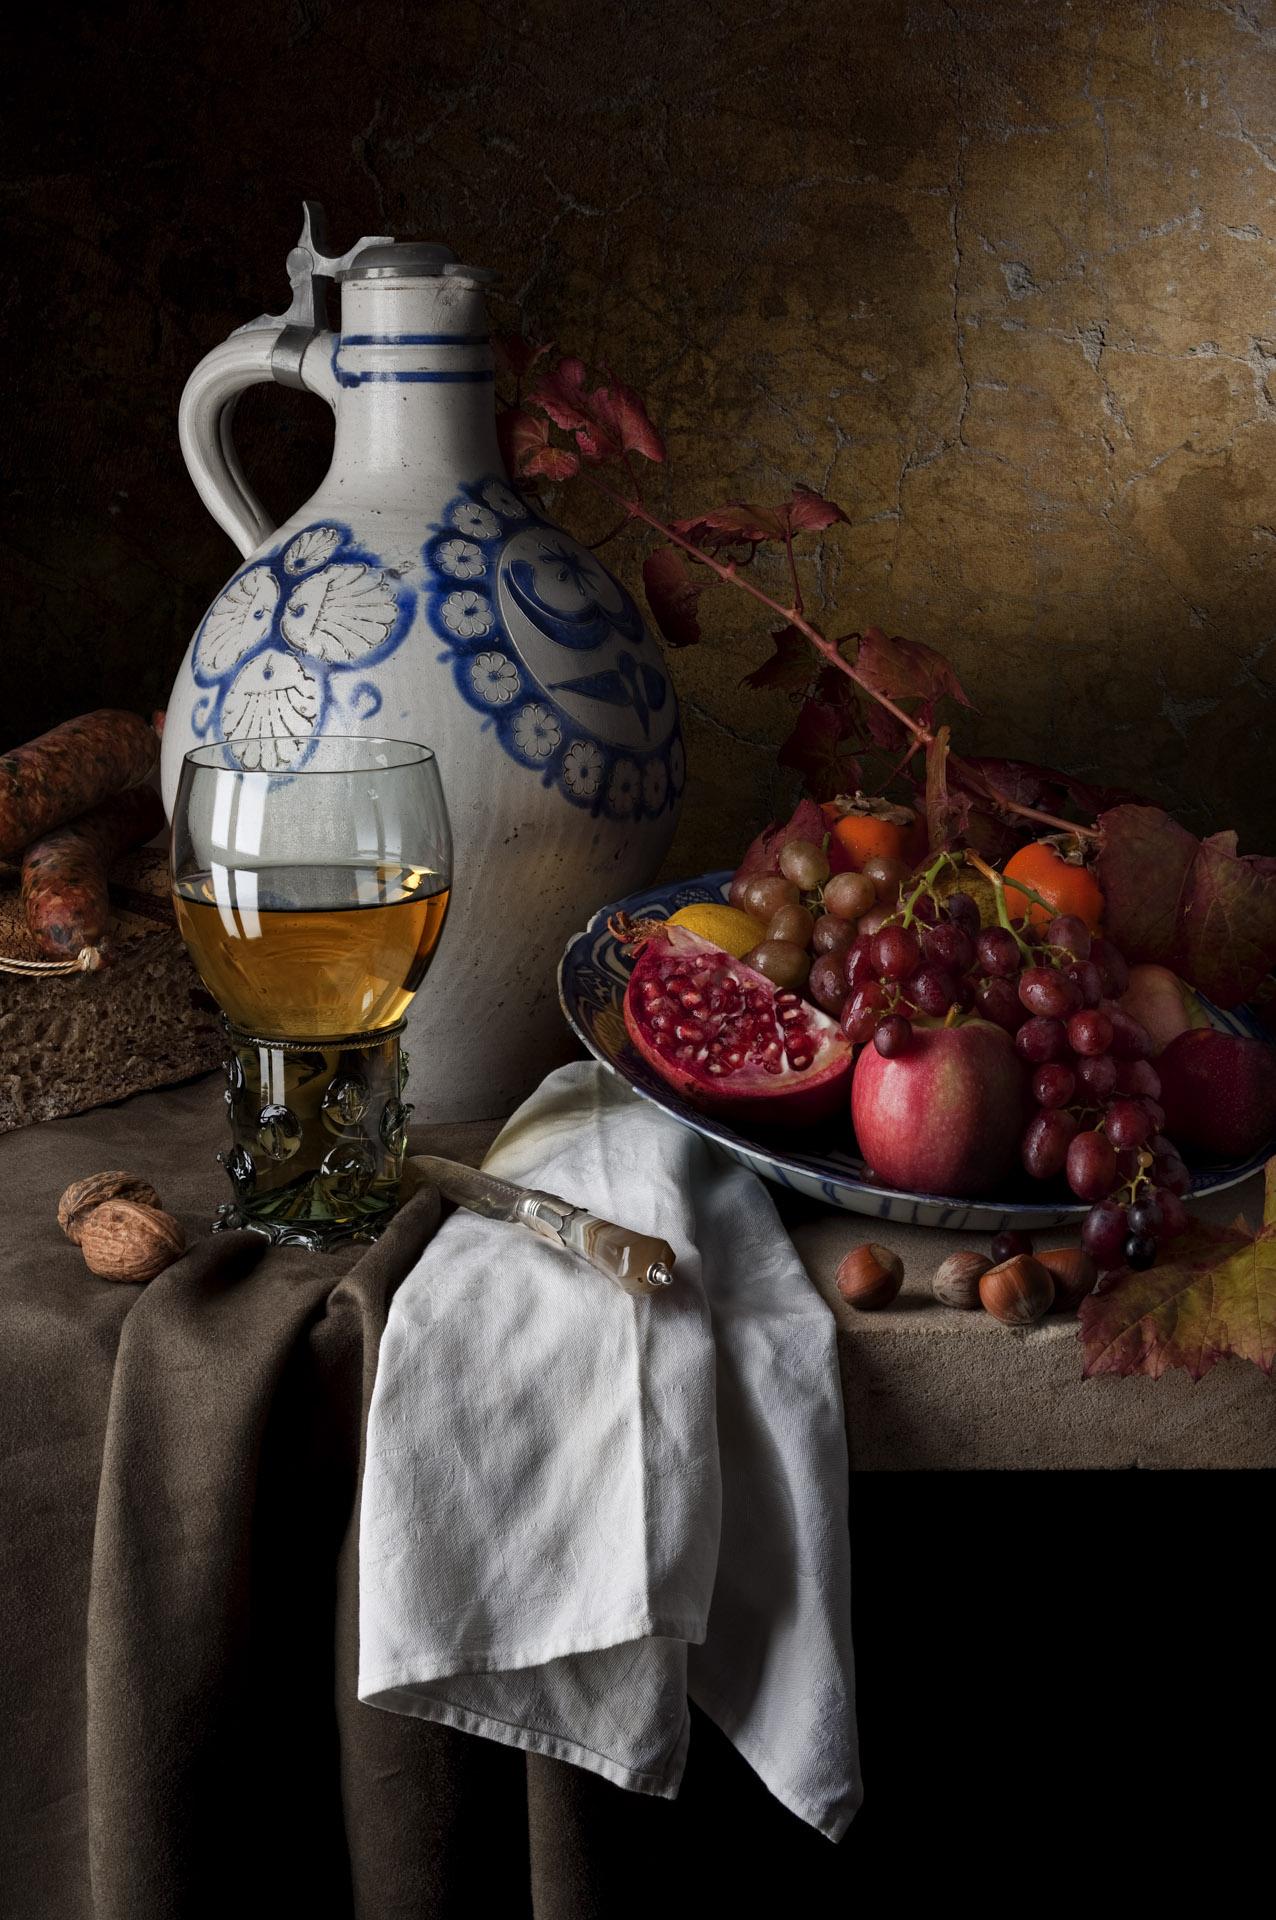 Still life with stoneware jug